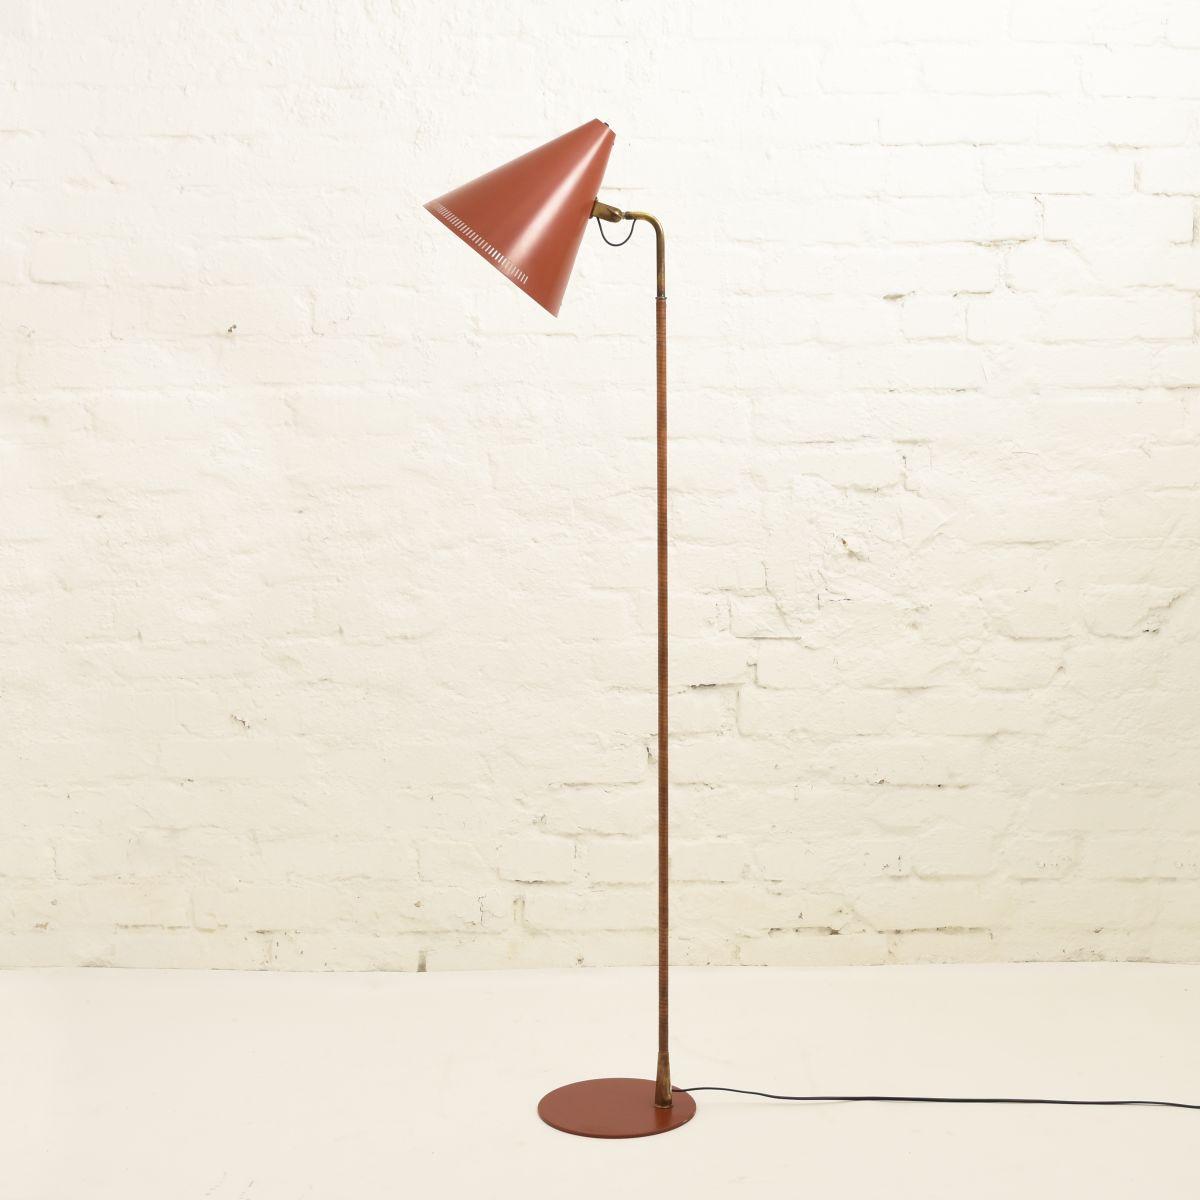 Tynell-Paavo-Floor-Lamp-Rusty-Red